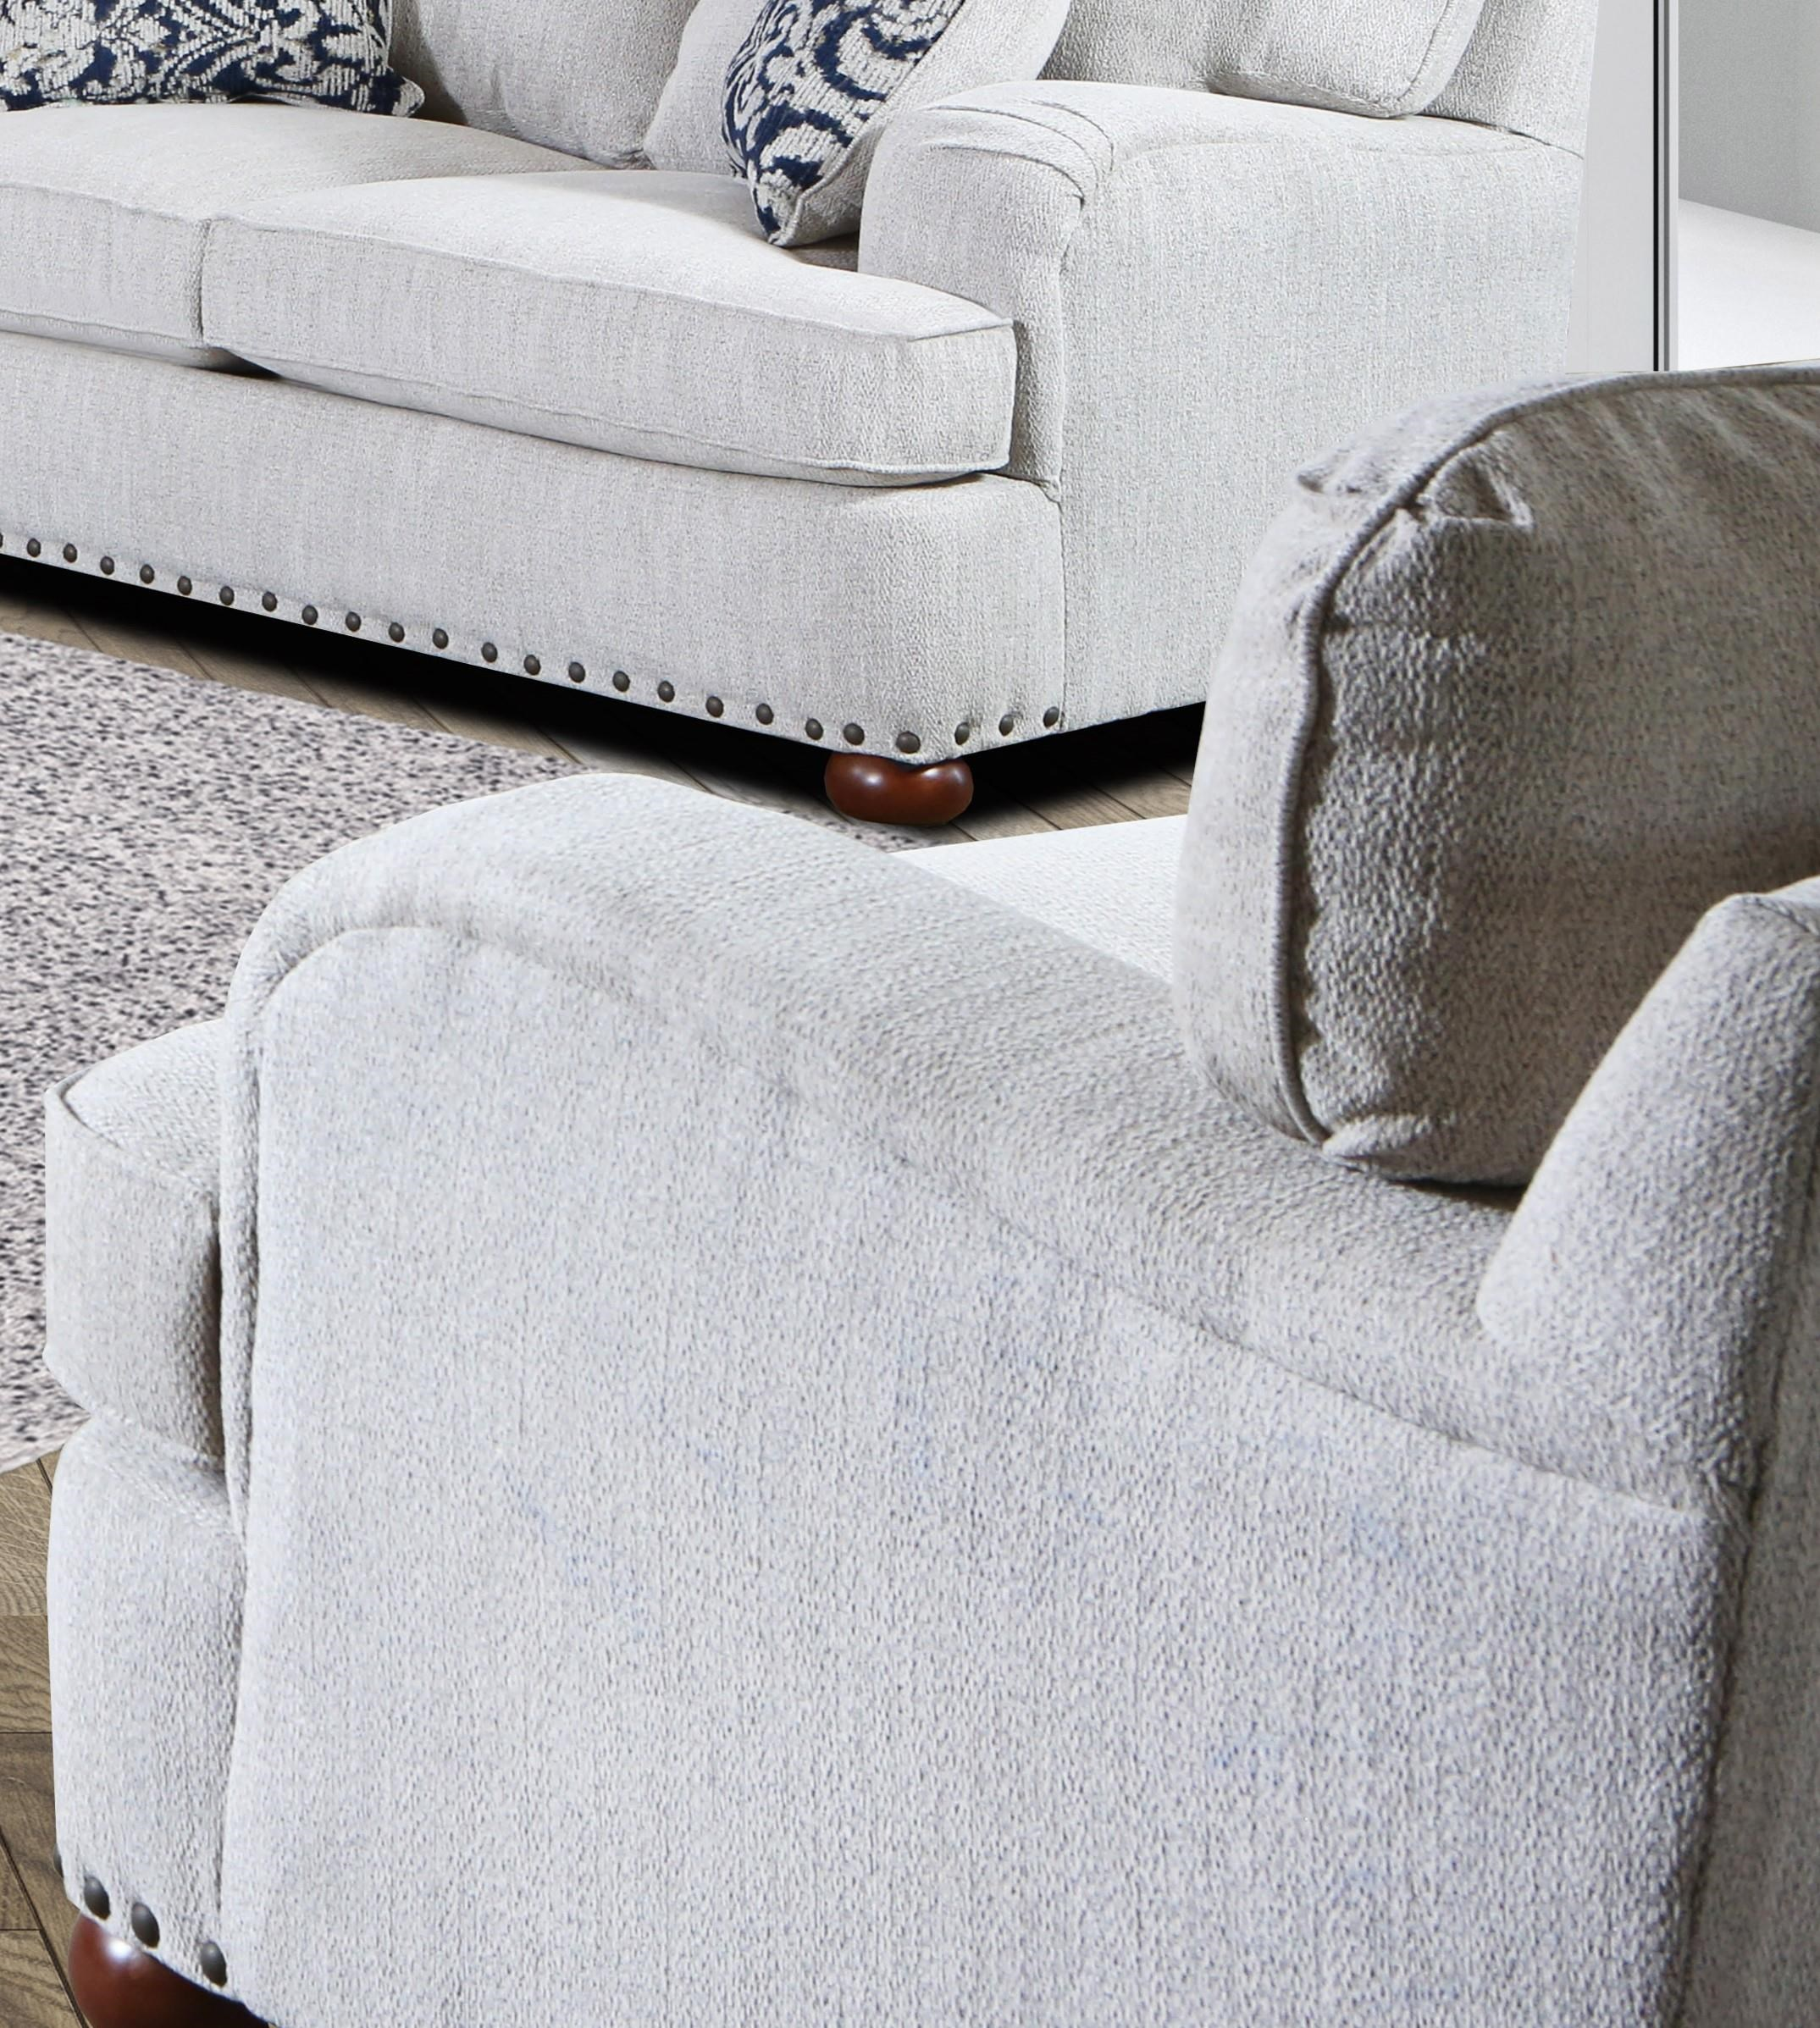 4100 Dixon Chair by Magnolia Upholstery Design at Furniture Fair - North Carolina